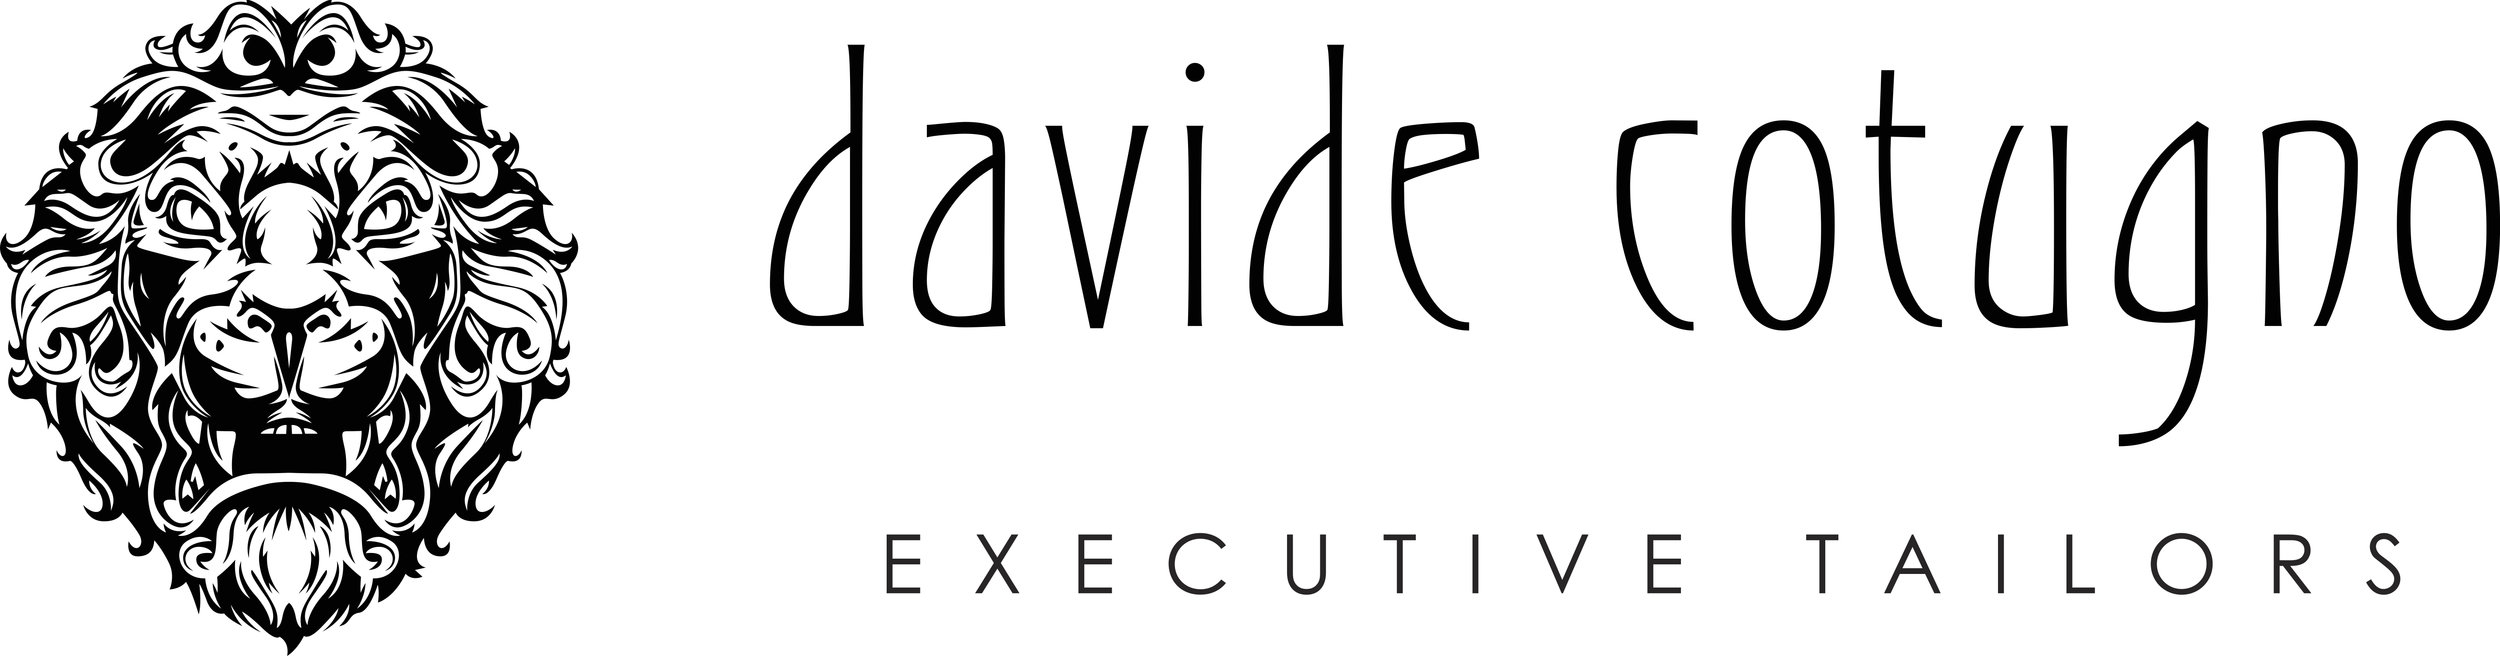 DGC Executive Tailors - Fashion